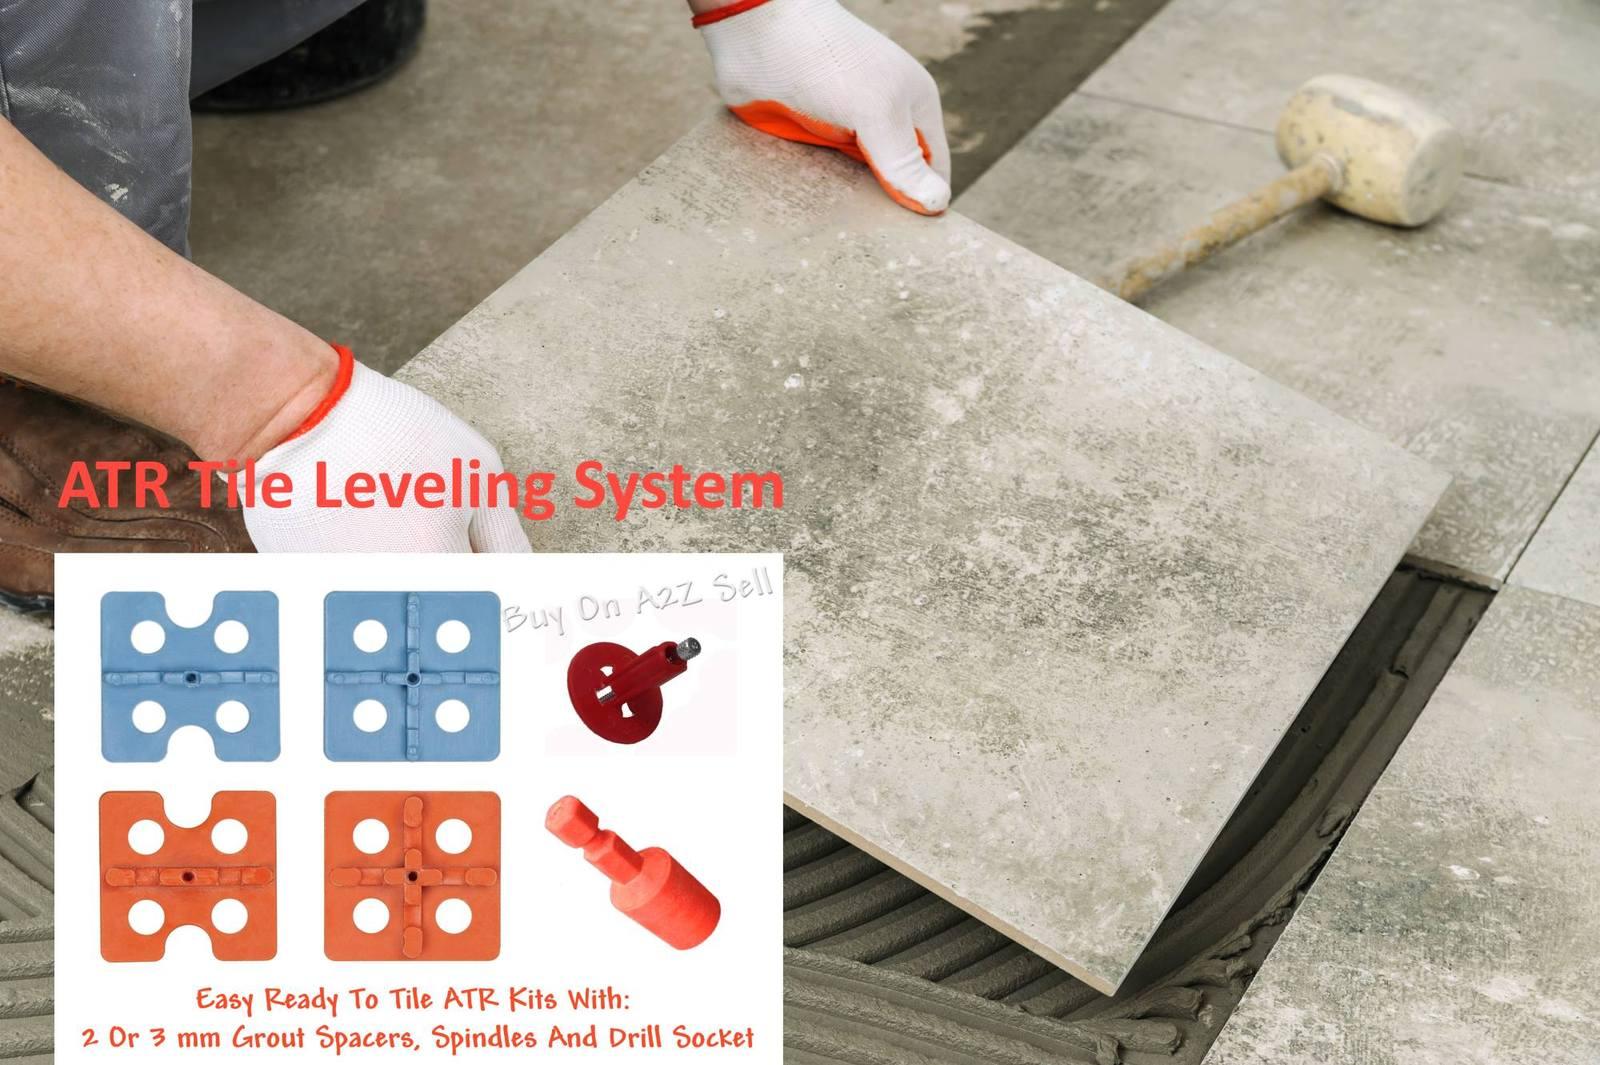 Atr tile leveling alignment system diy kit 3mm floor for Diy dog bathing system